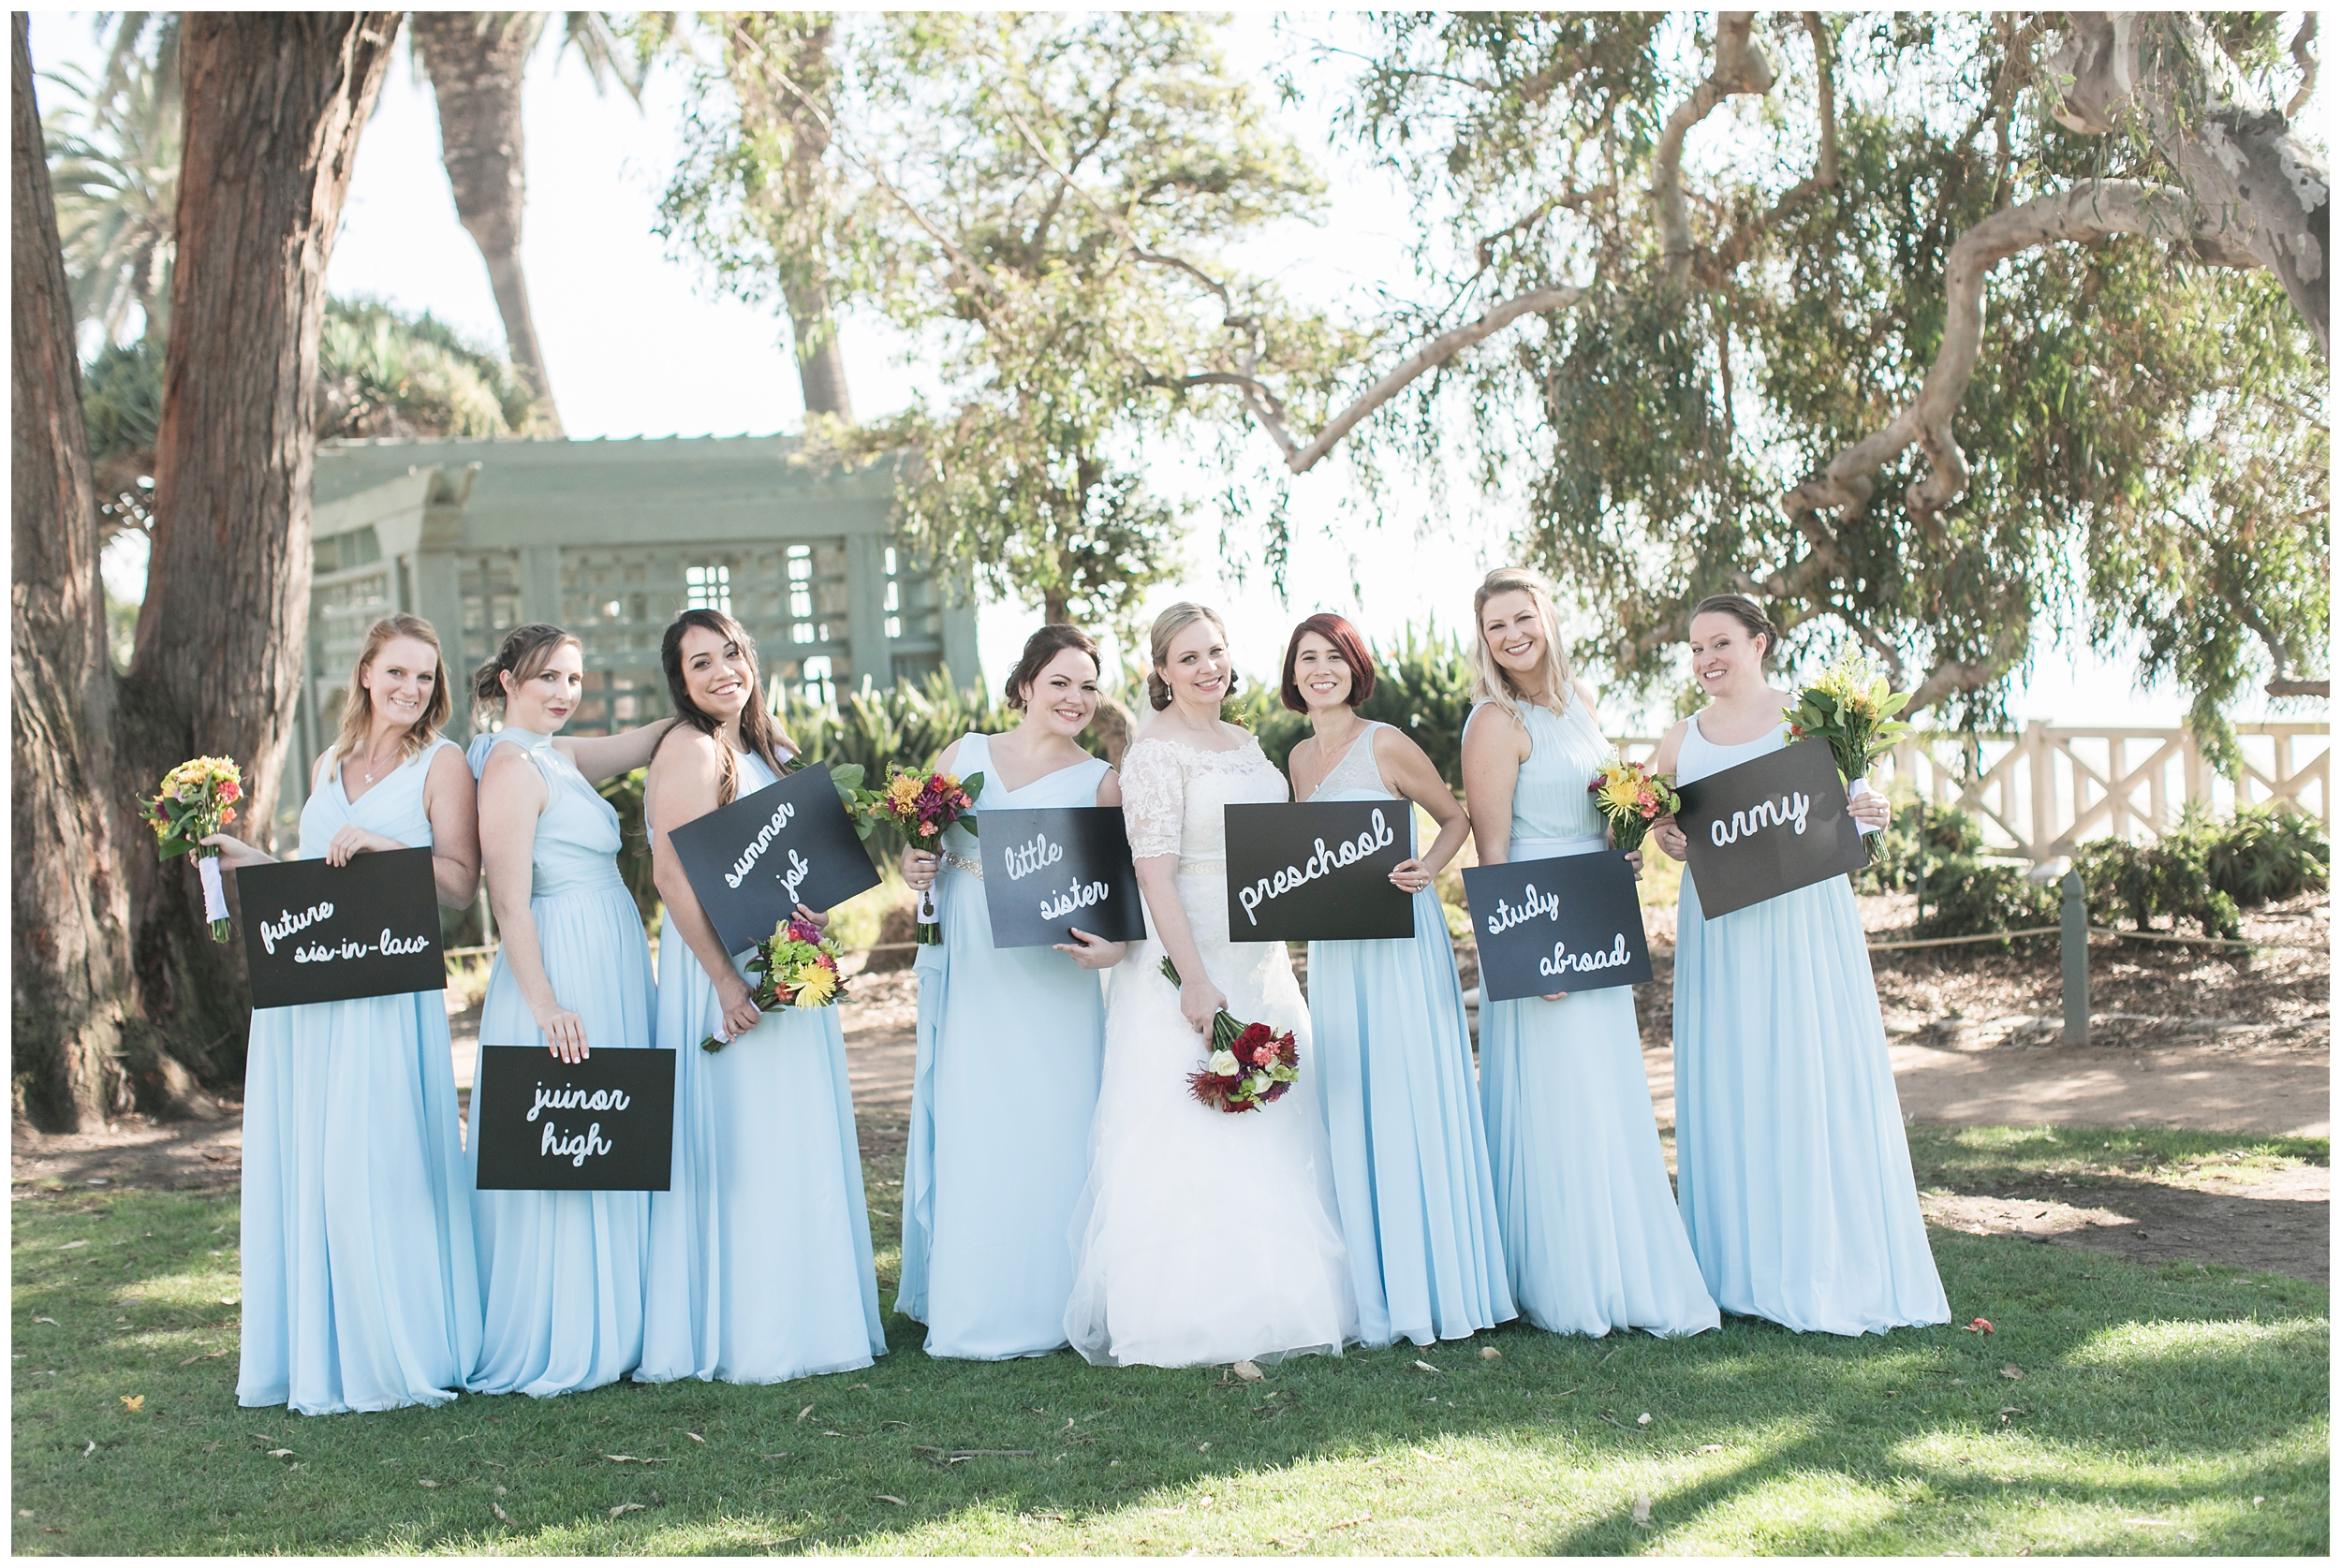 santa monica beach themed wedding carrie vines-006.jpg